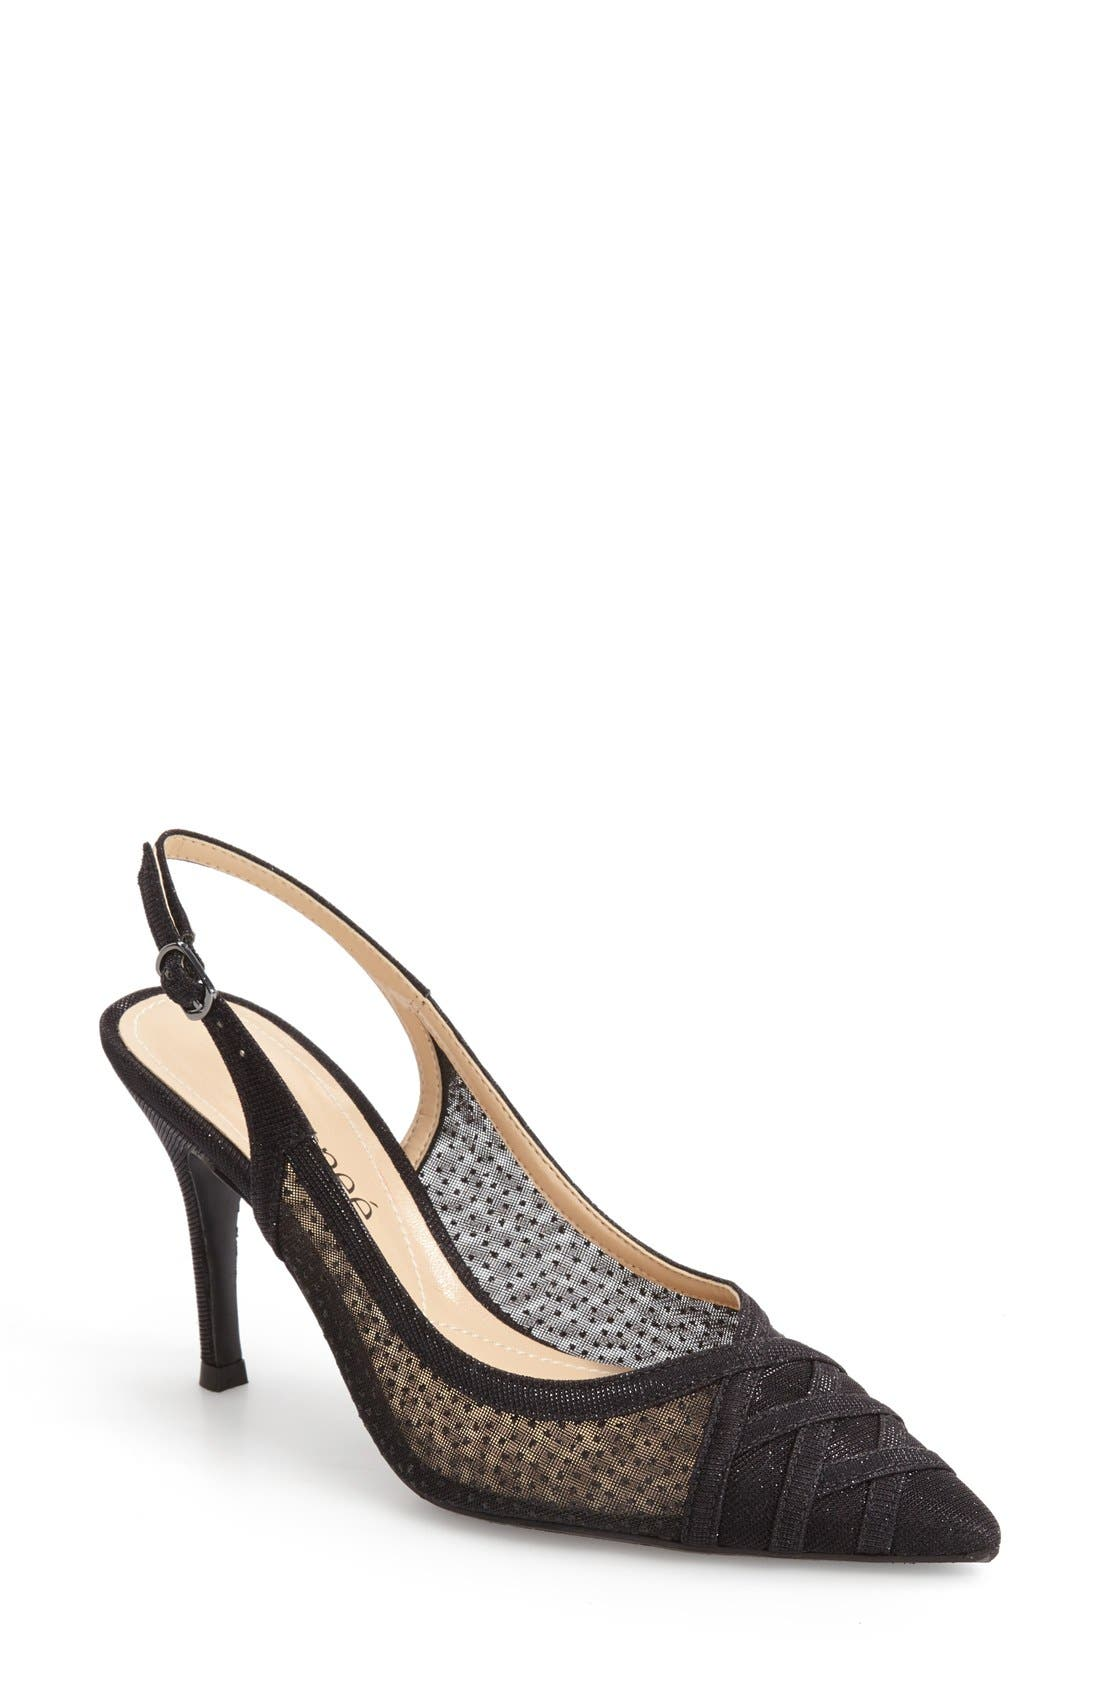 J. Renee Savina Pointed Toe Slingback Pump,                         Main,                         color, Black Glitter